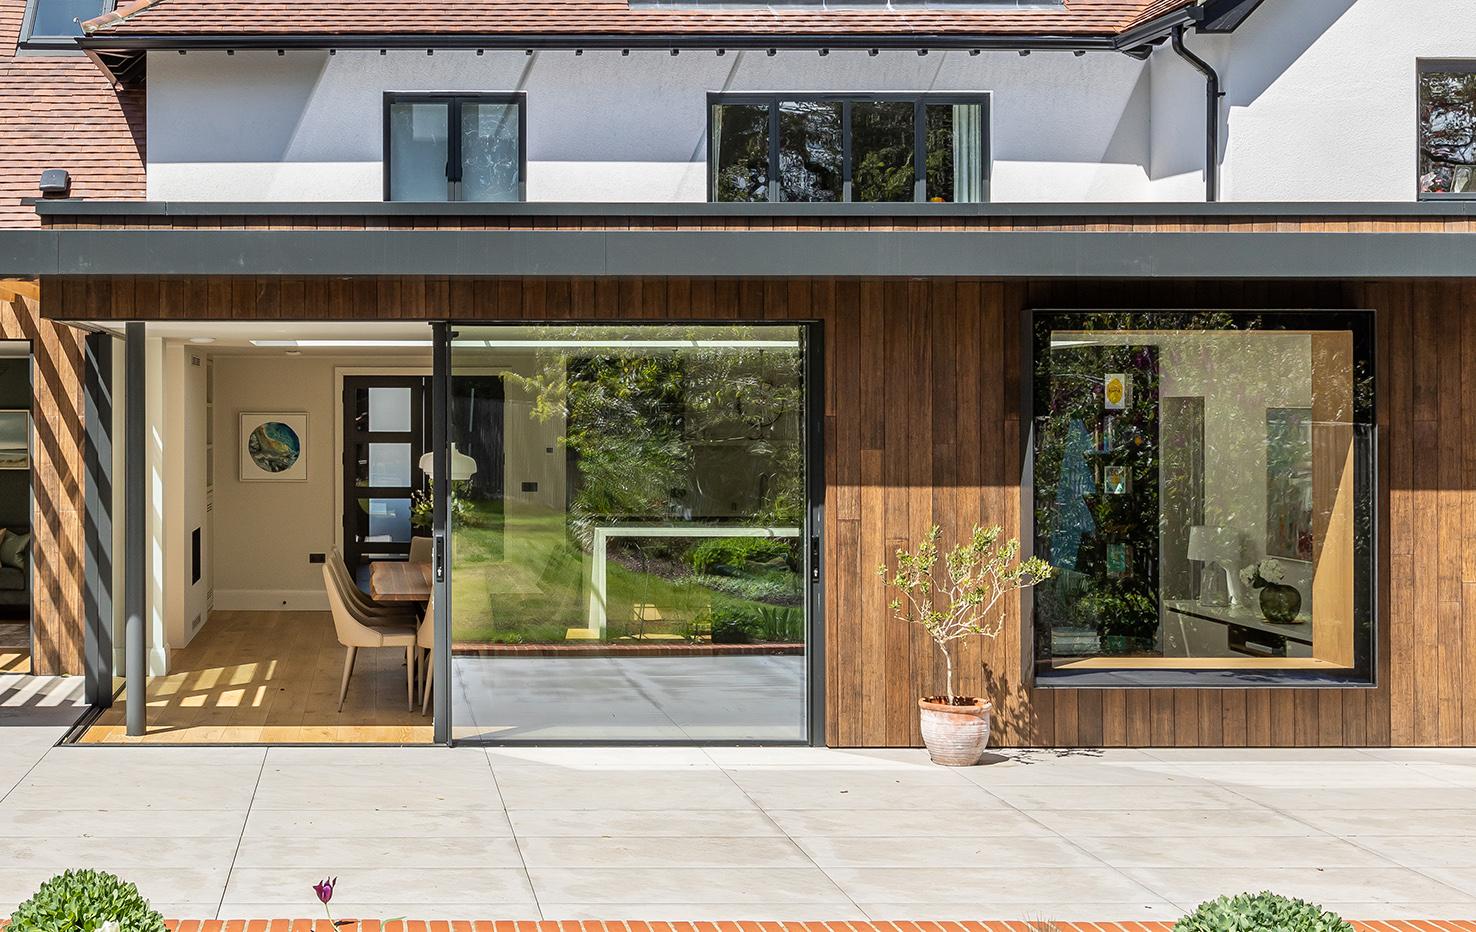 Chilterns-Hill-SL320-Rooflight-Fixed-Window_10